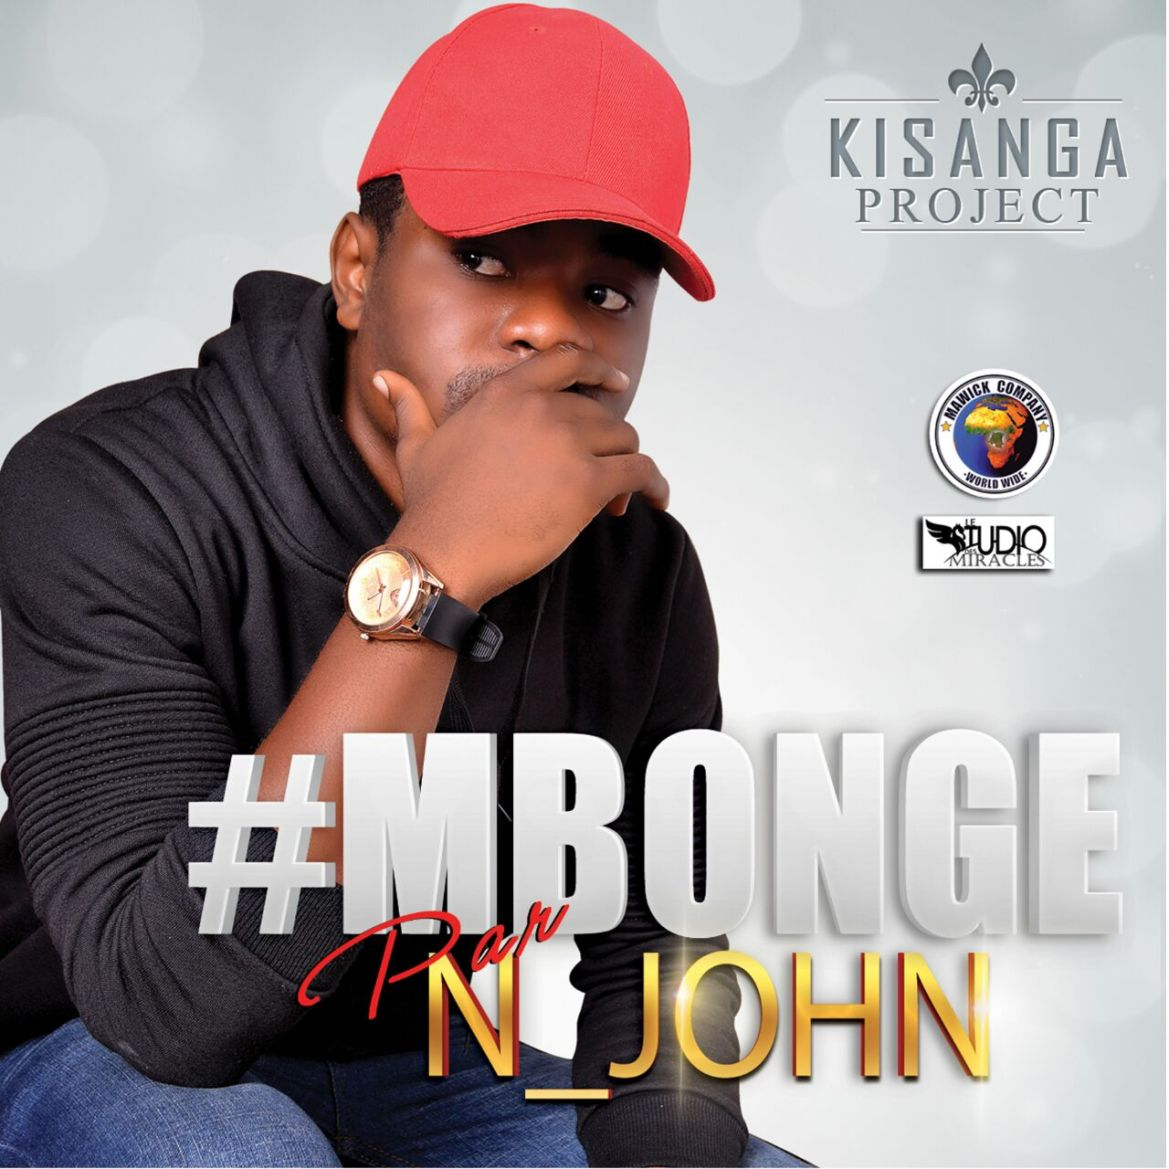 N John - mbonge